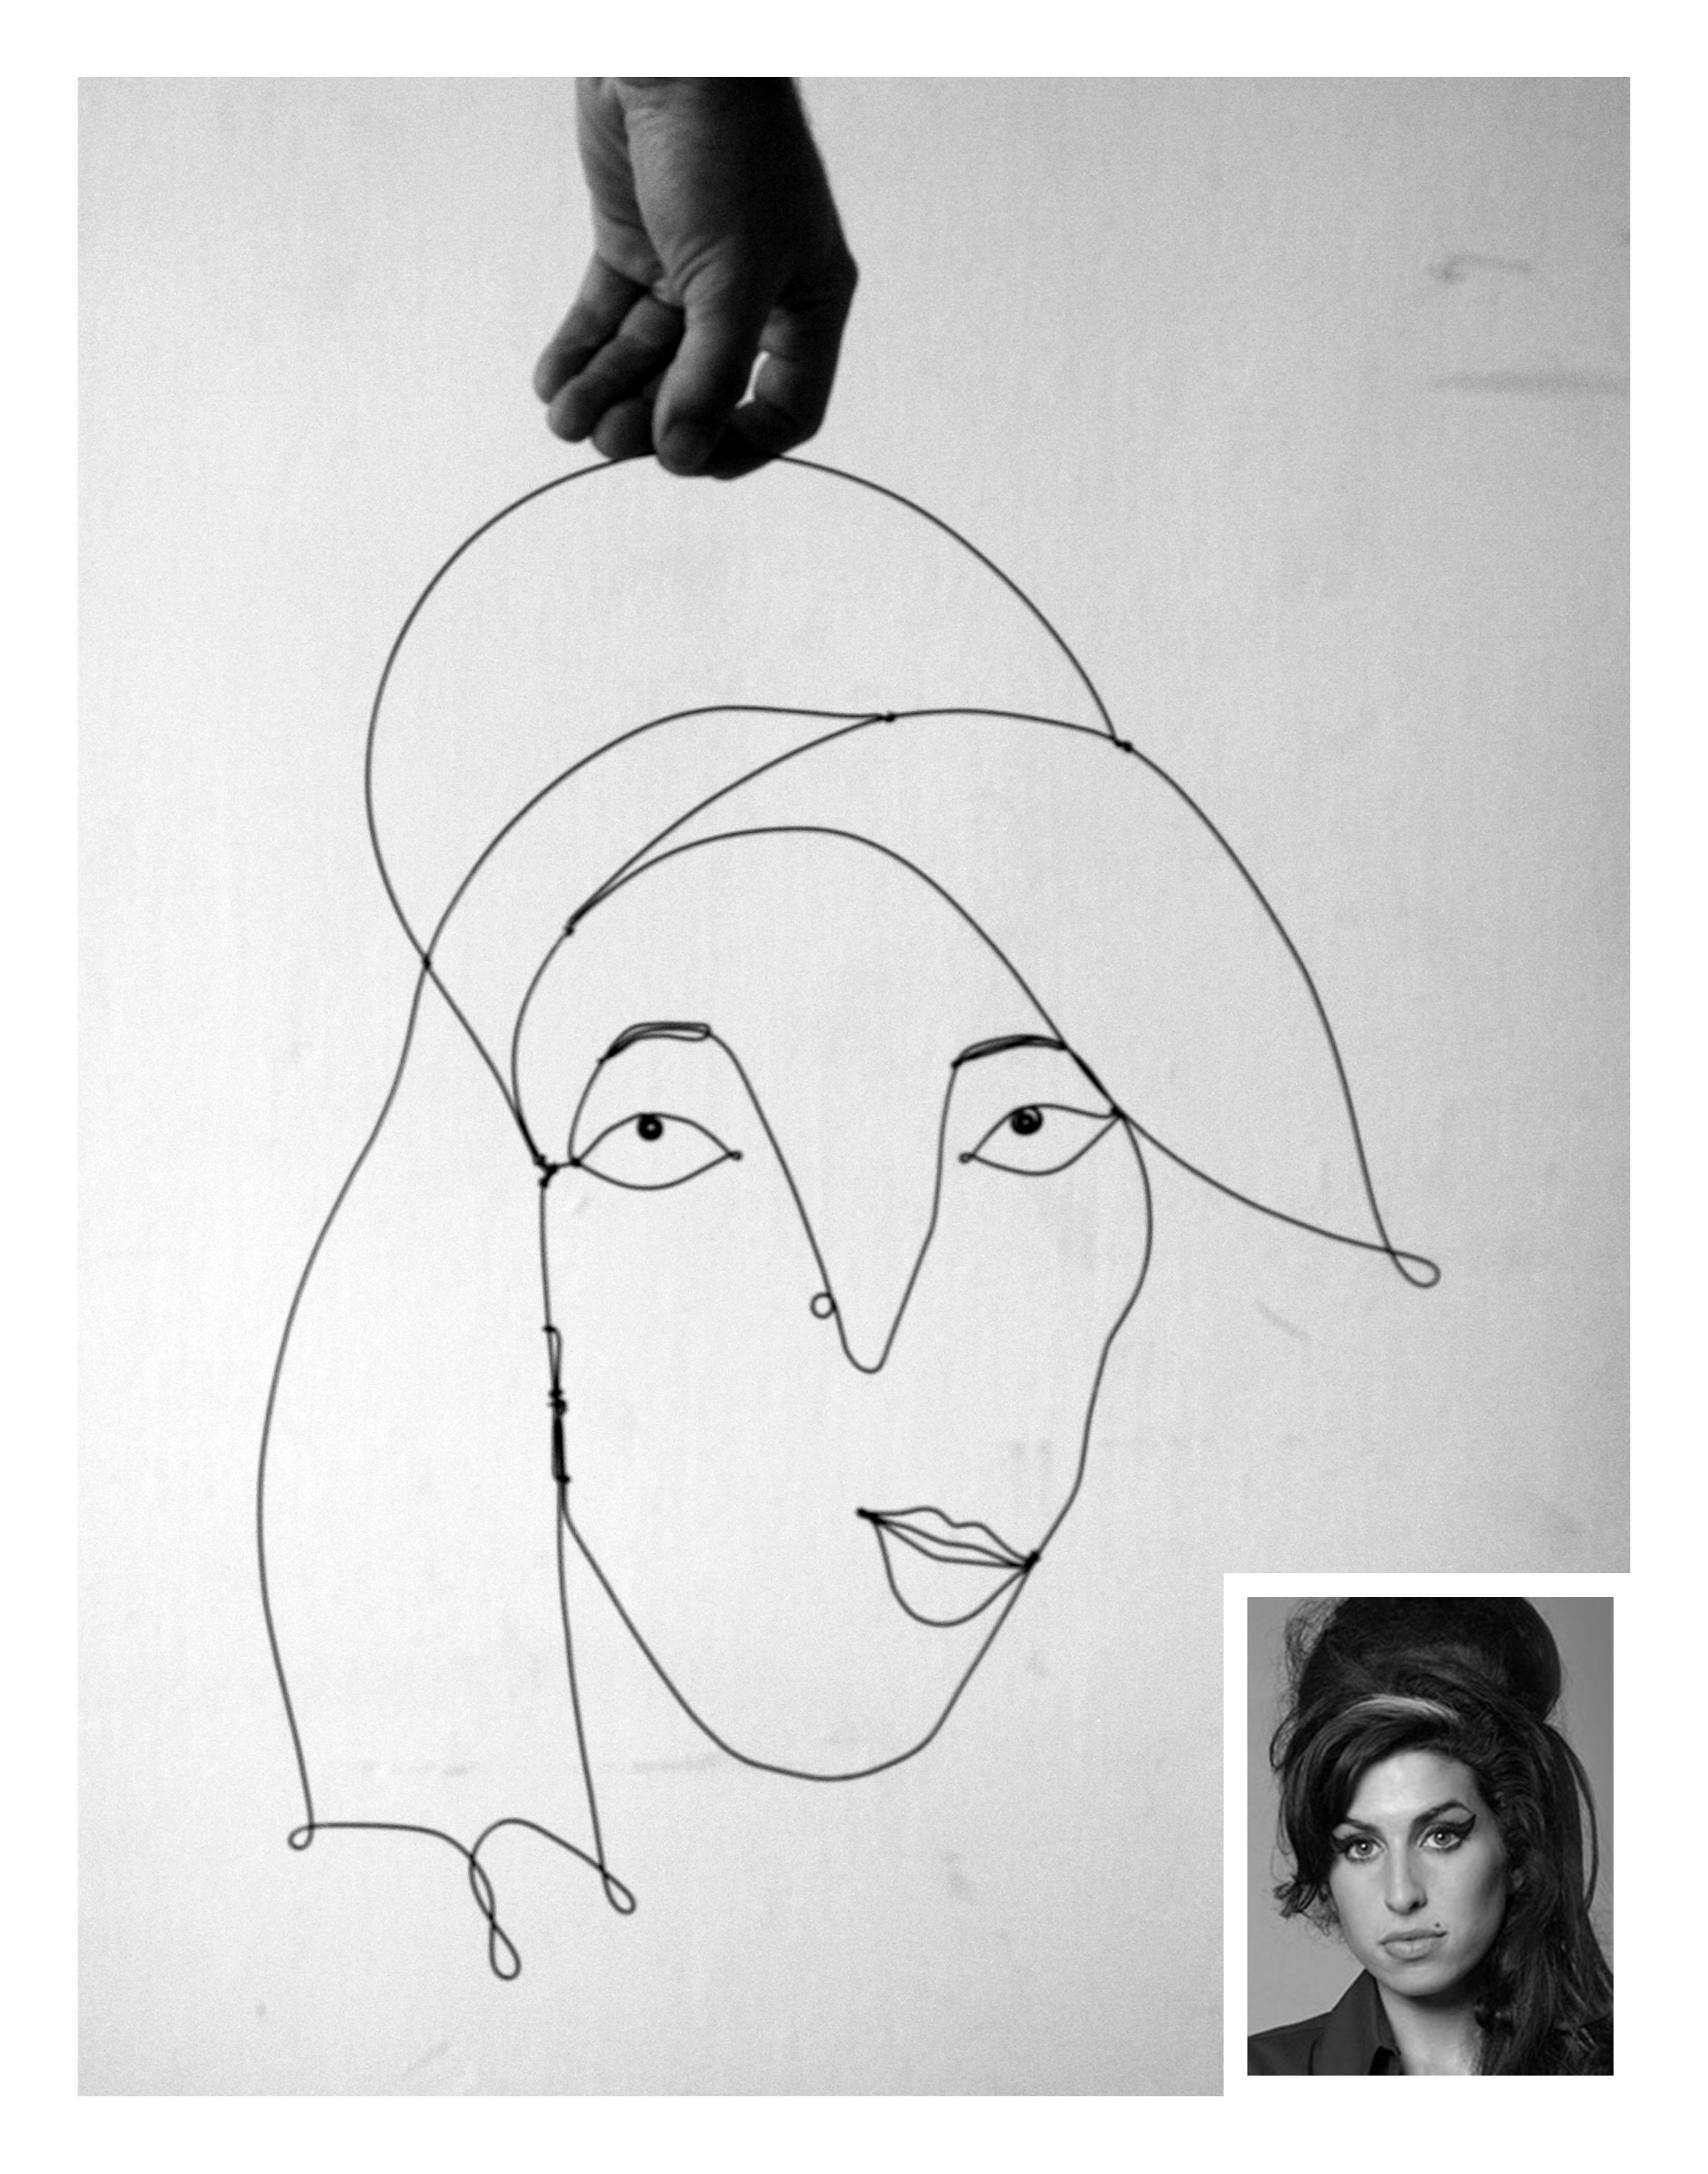 Emy Winehouse